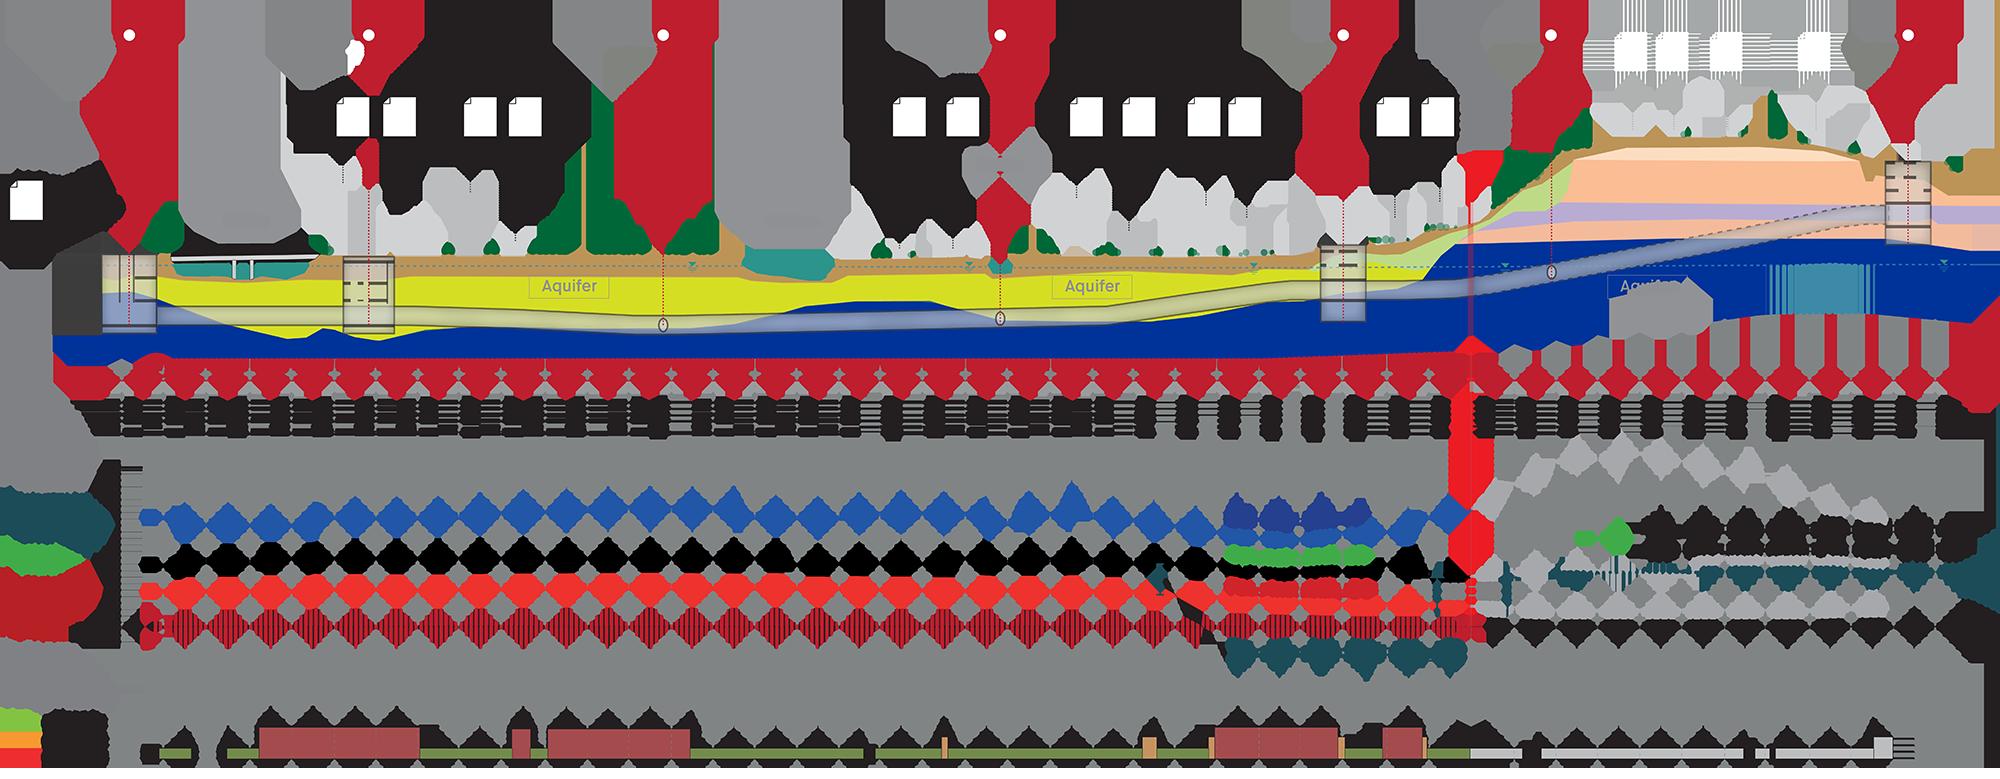 urban tunnel tool representation